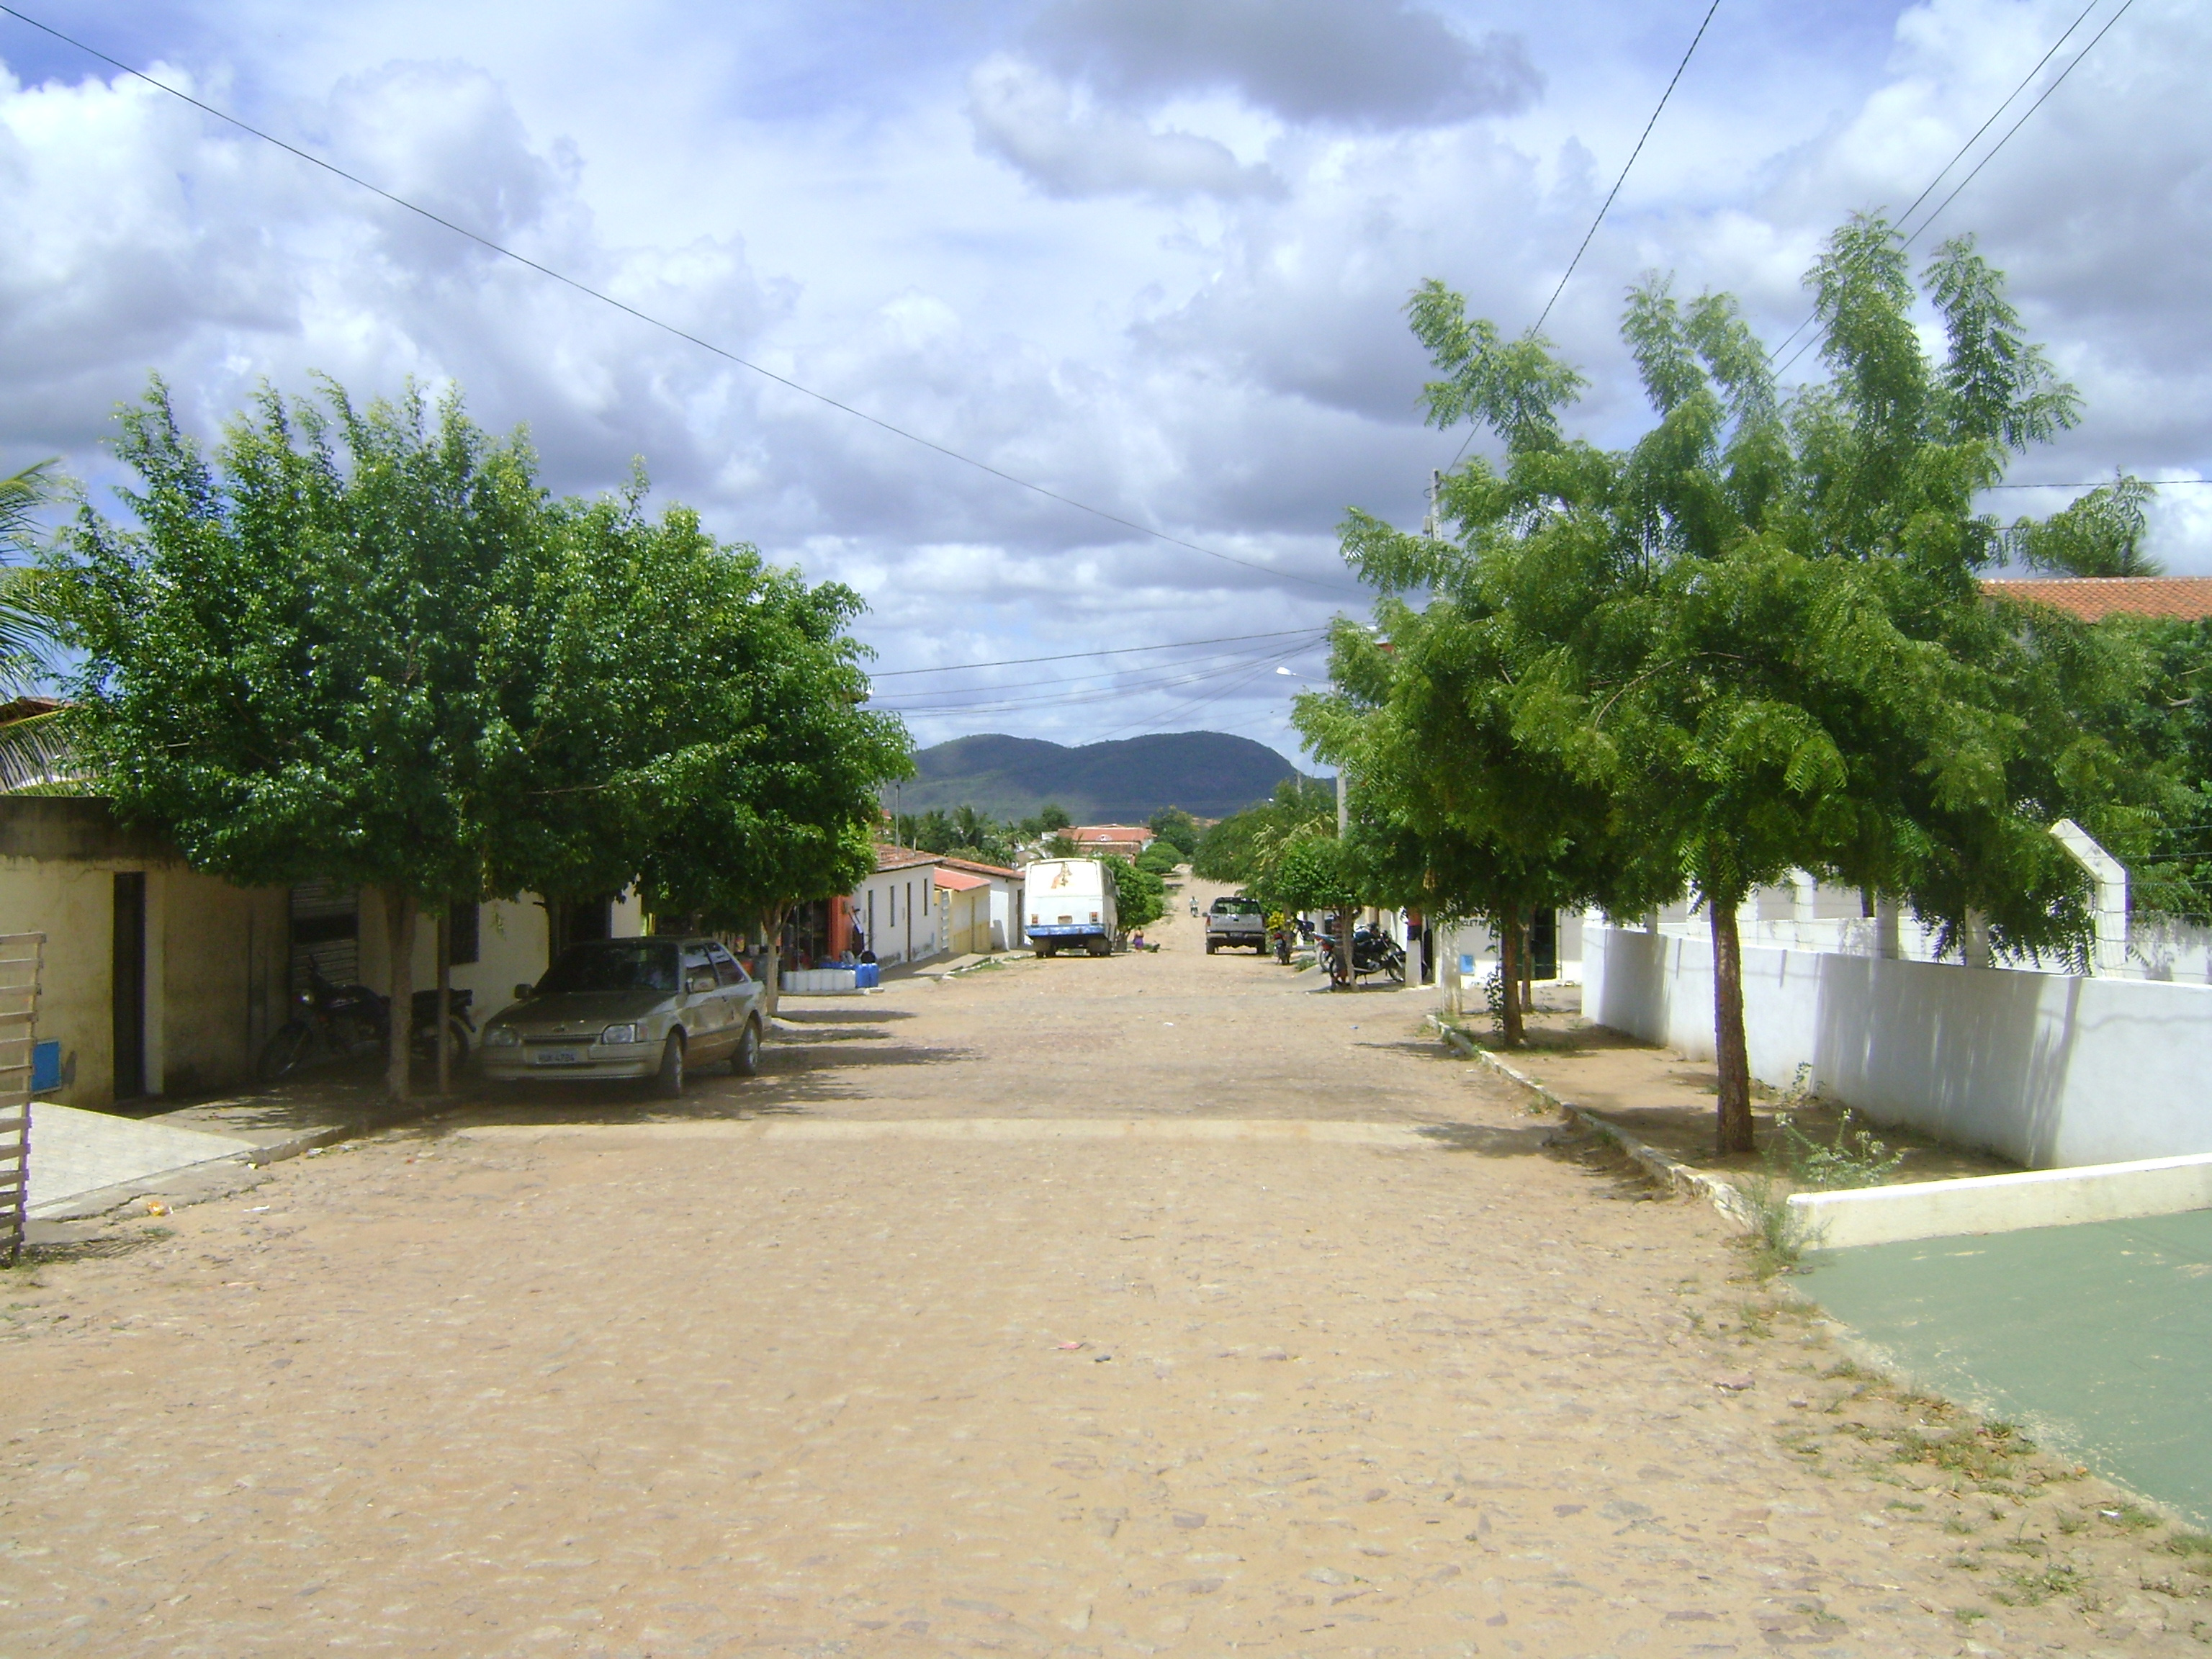 Itatira Ceará fonte: upload.wikimedia.org